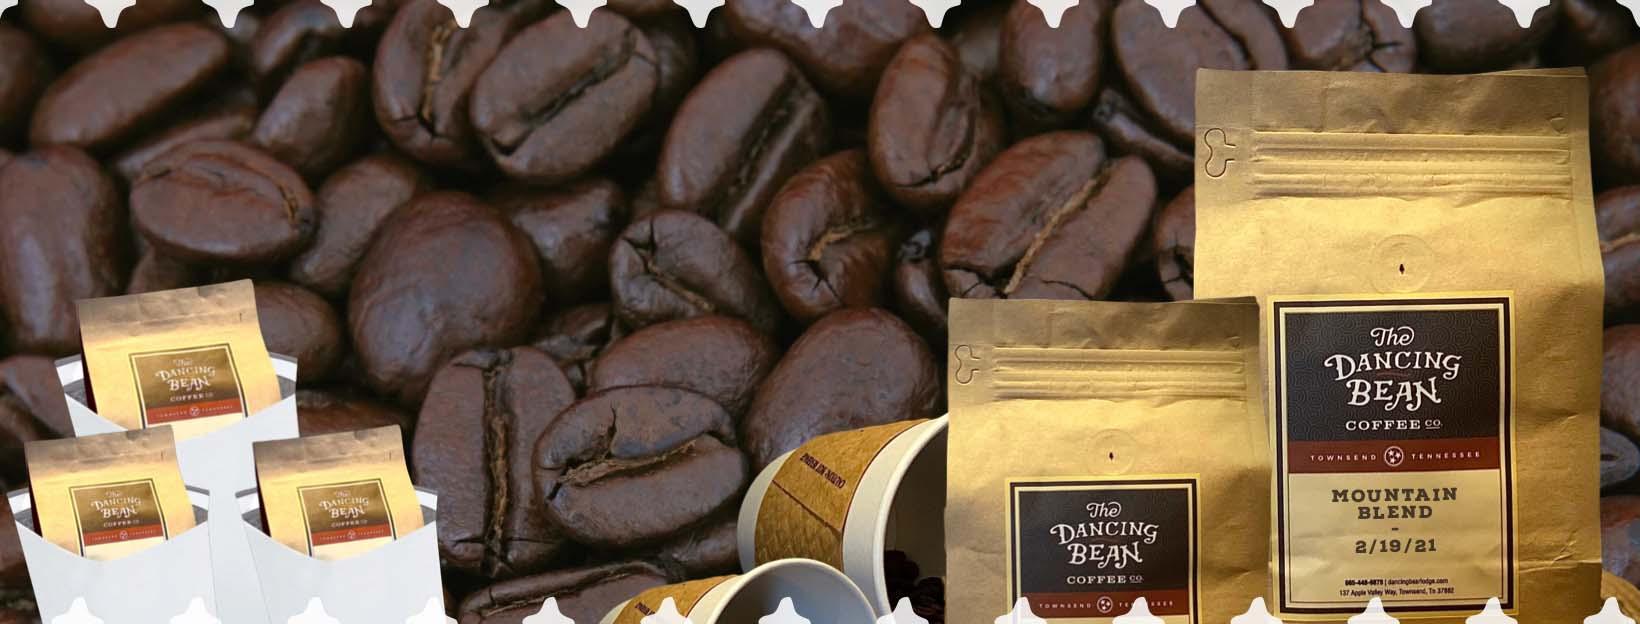 Dancing Bean Coffee Mountain Blend